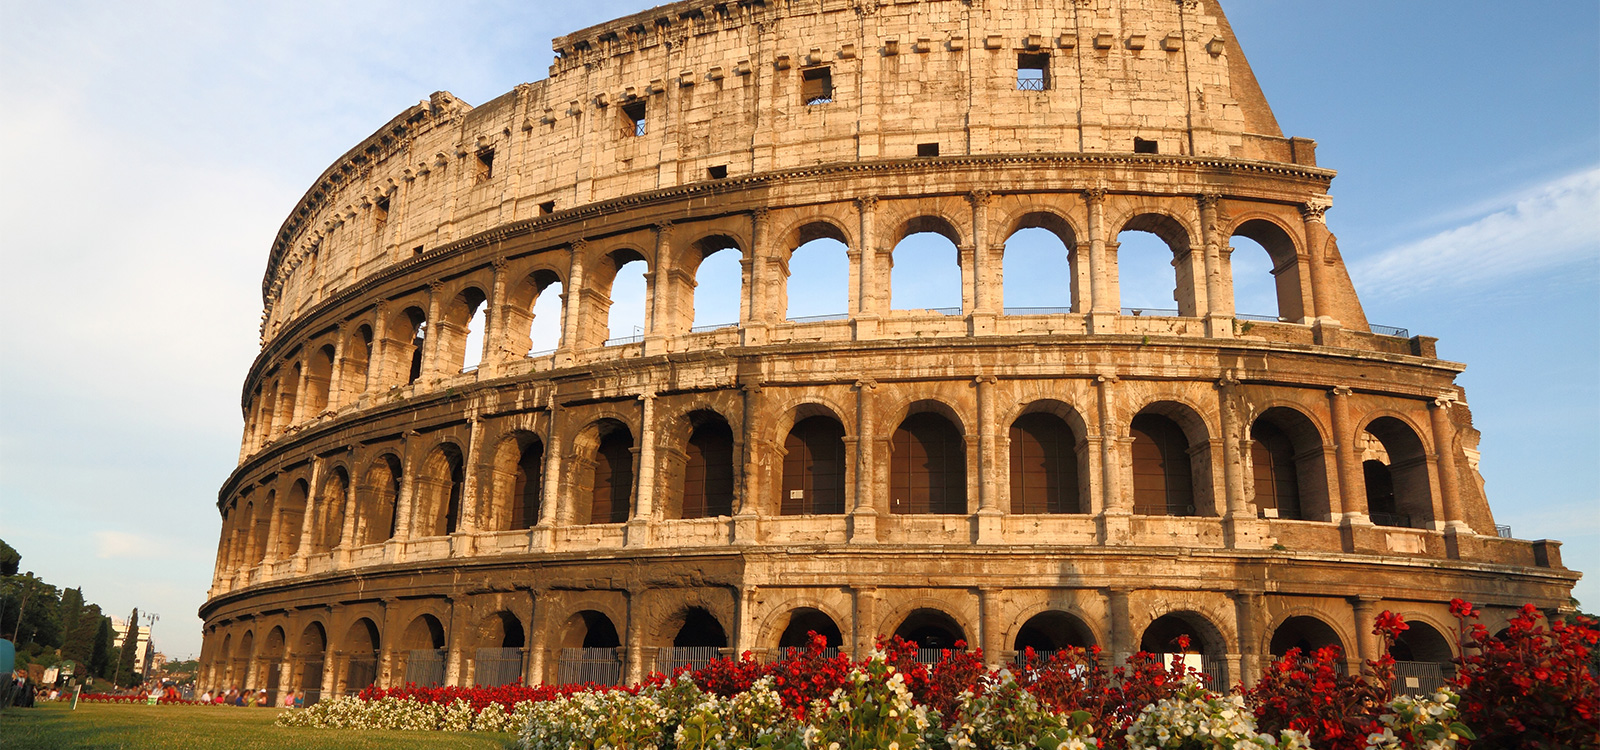 Turismo, Web e Italia: Collegatevi!-big